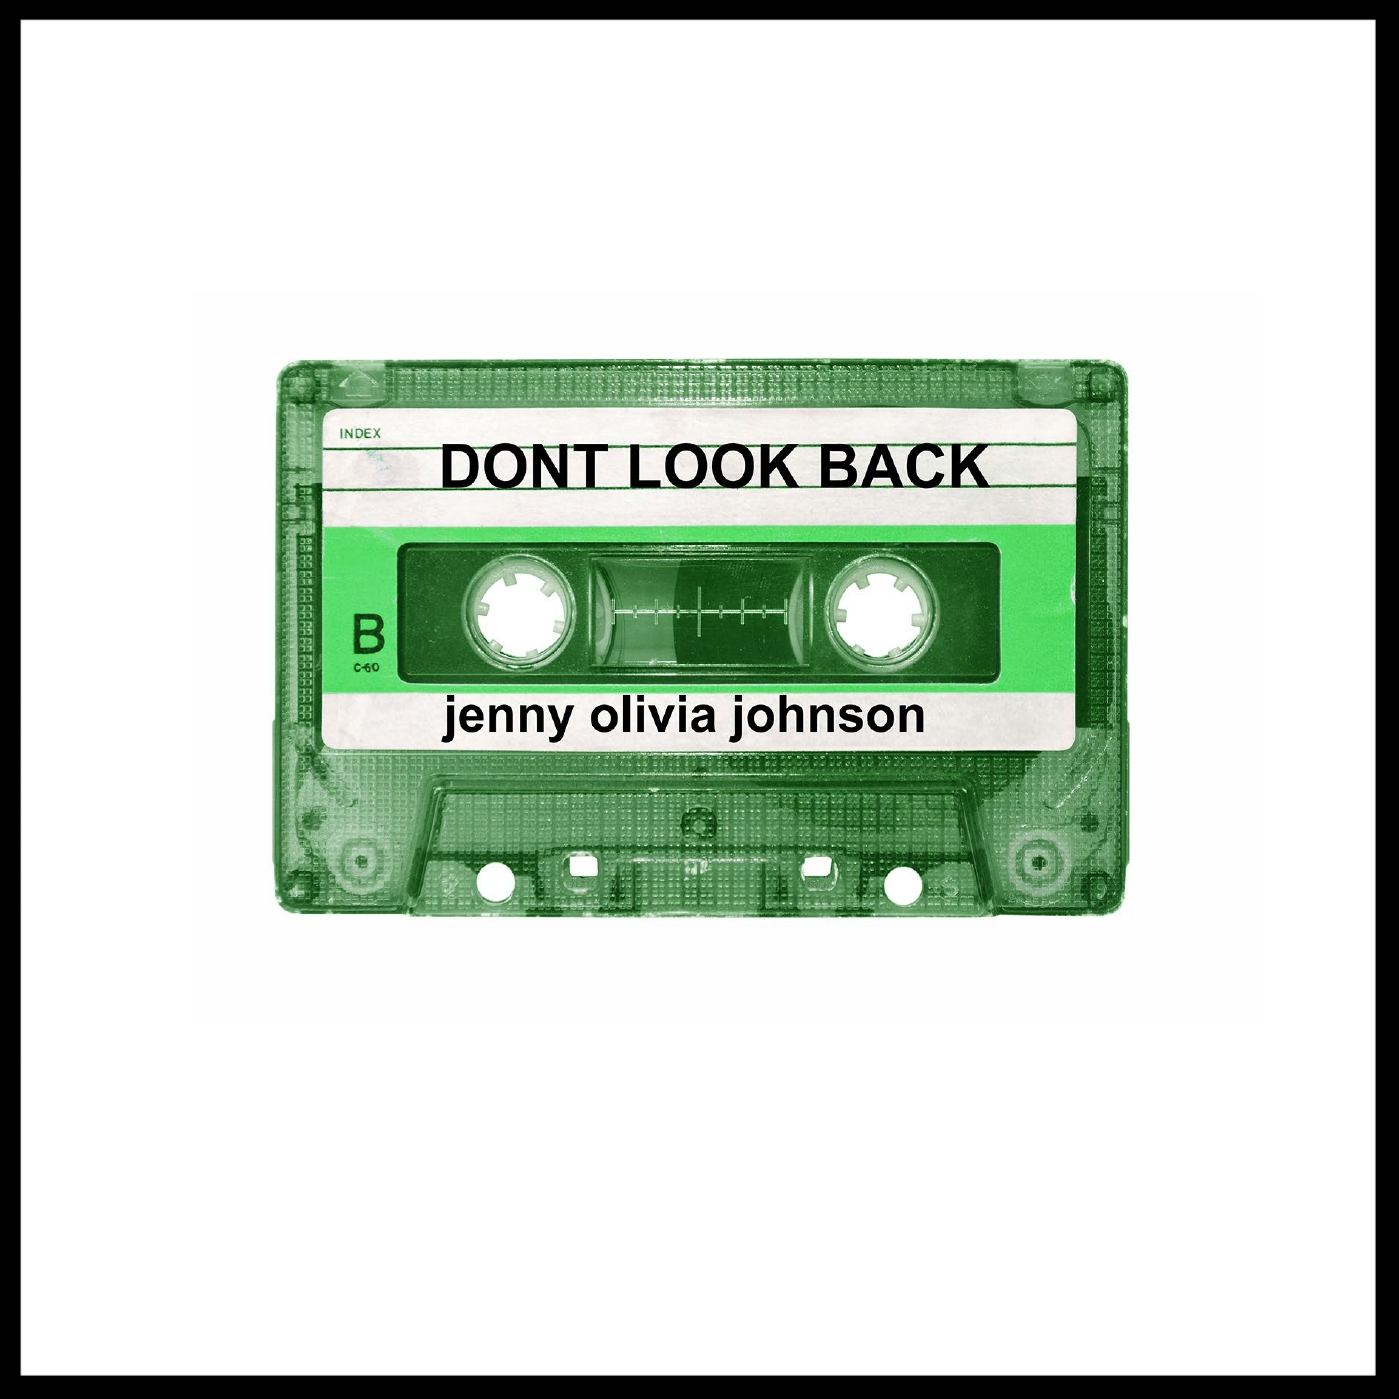 <b>2015</b><br> DON'T LOOK BACK<br>Jenny Olivia Johnson<br><small> Innova Records</small>